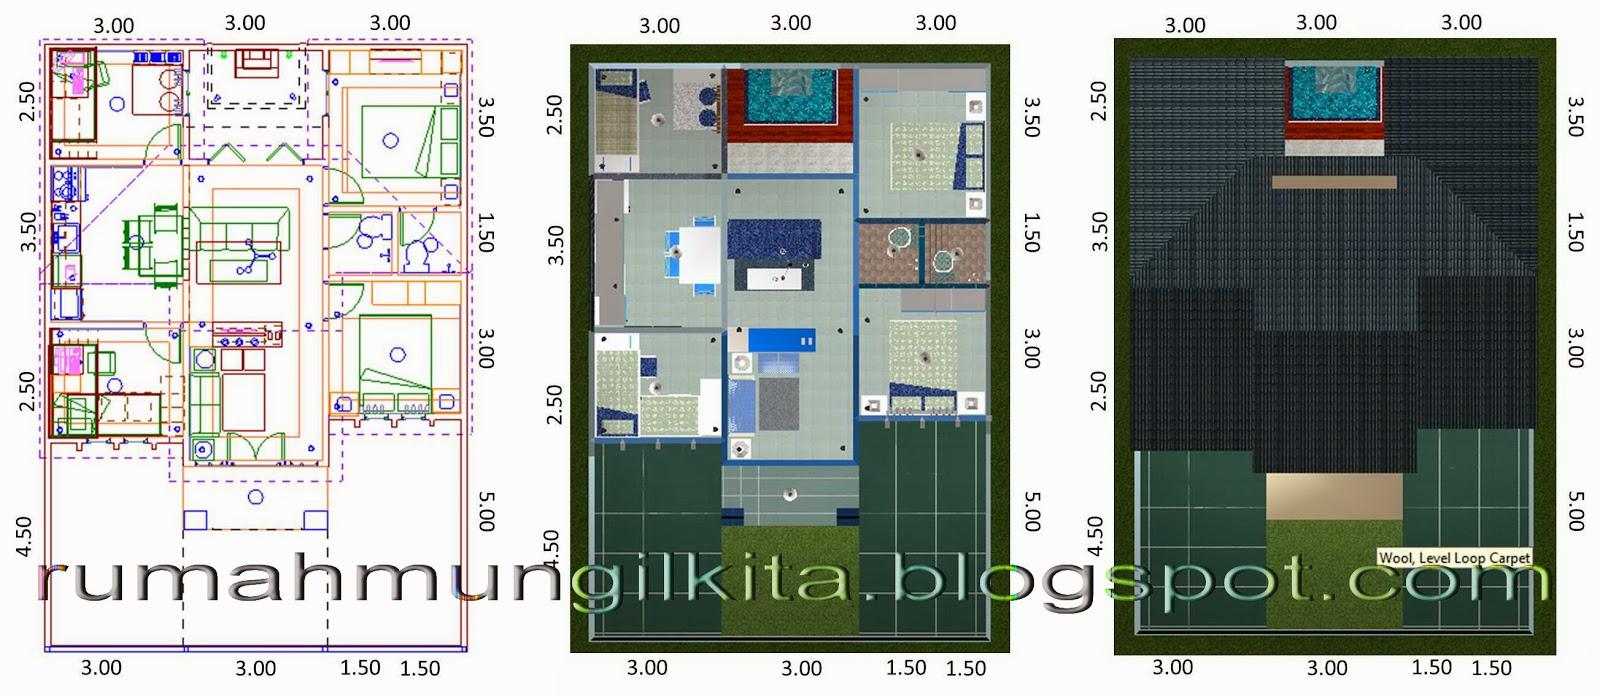 rumah mungil minimalis bernuansa biru tipe 70 4 kamar tidur denah 2 dimensi